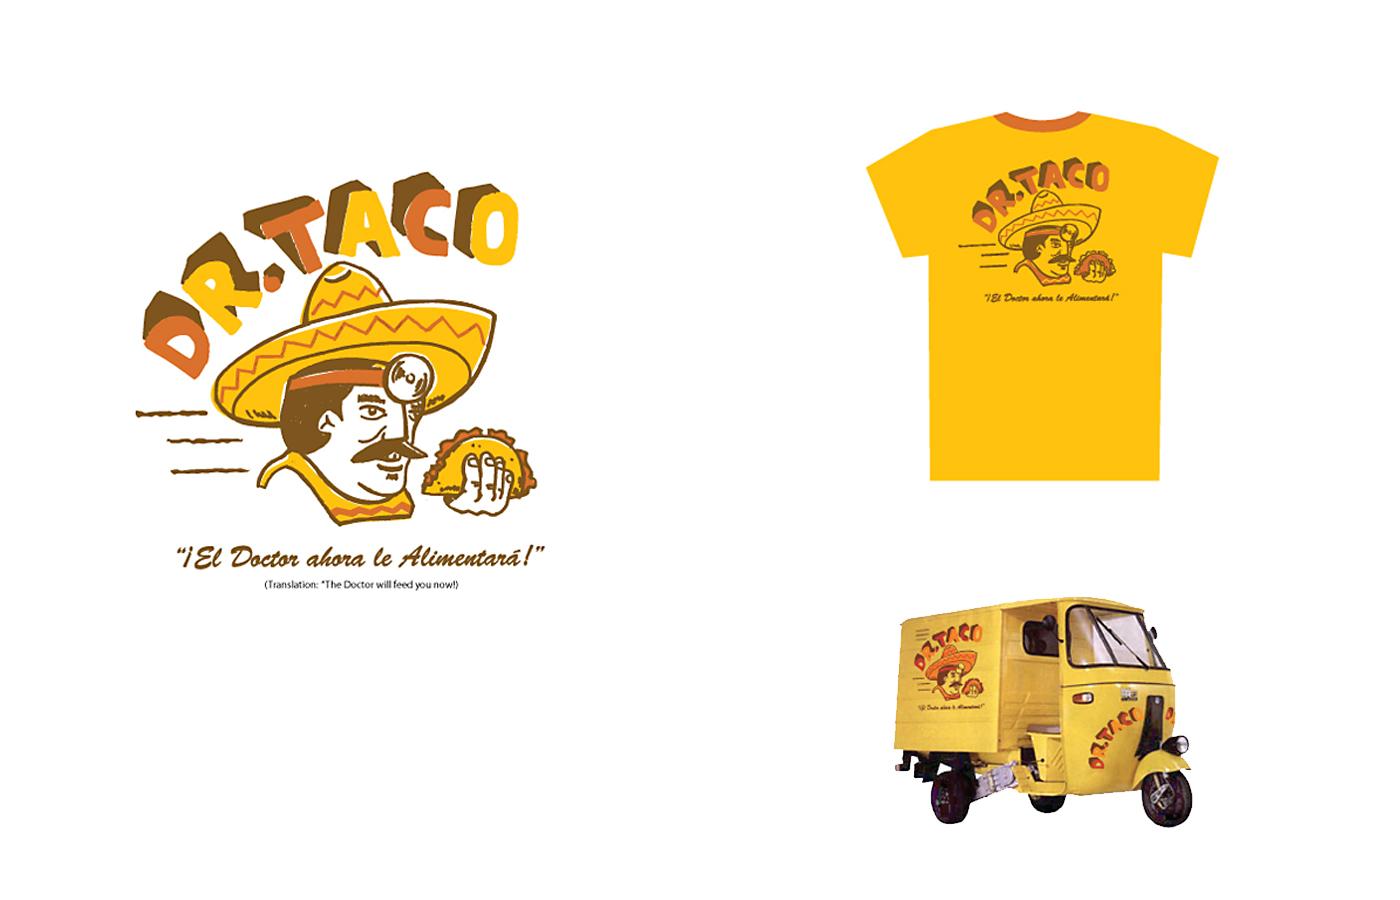 Dr.Taco Mobile Tacos